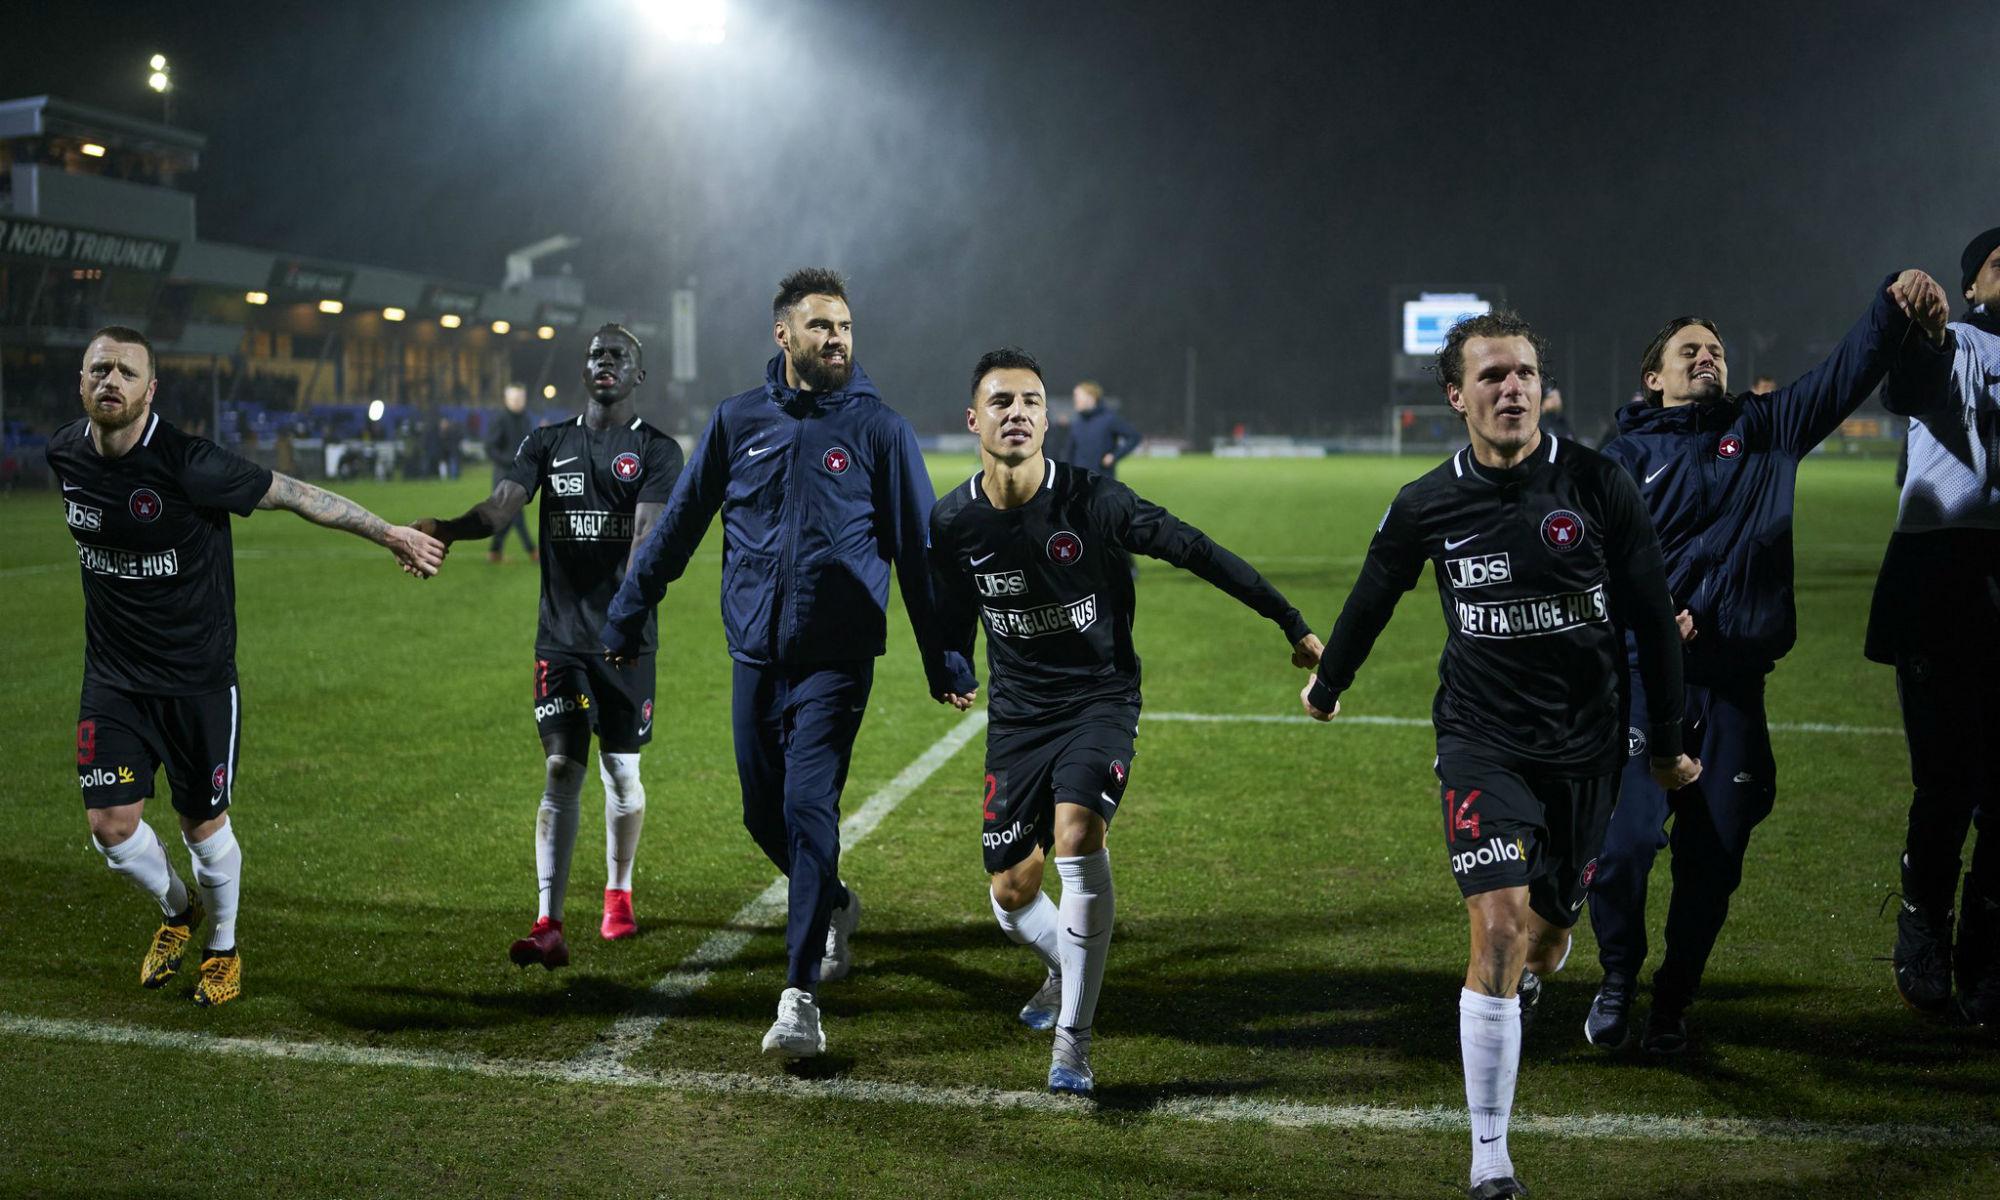 Aussies Abroad: Mabil's FC Midtjylland open up double-figures lead at Danish Superliga summit